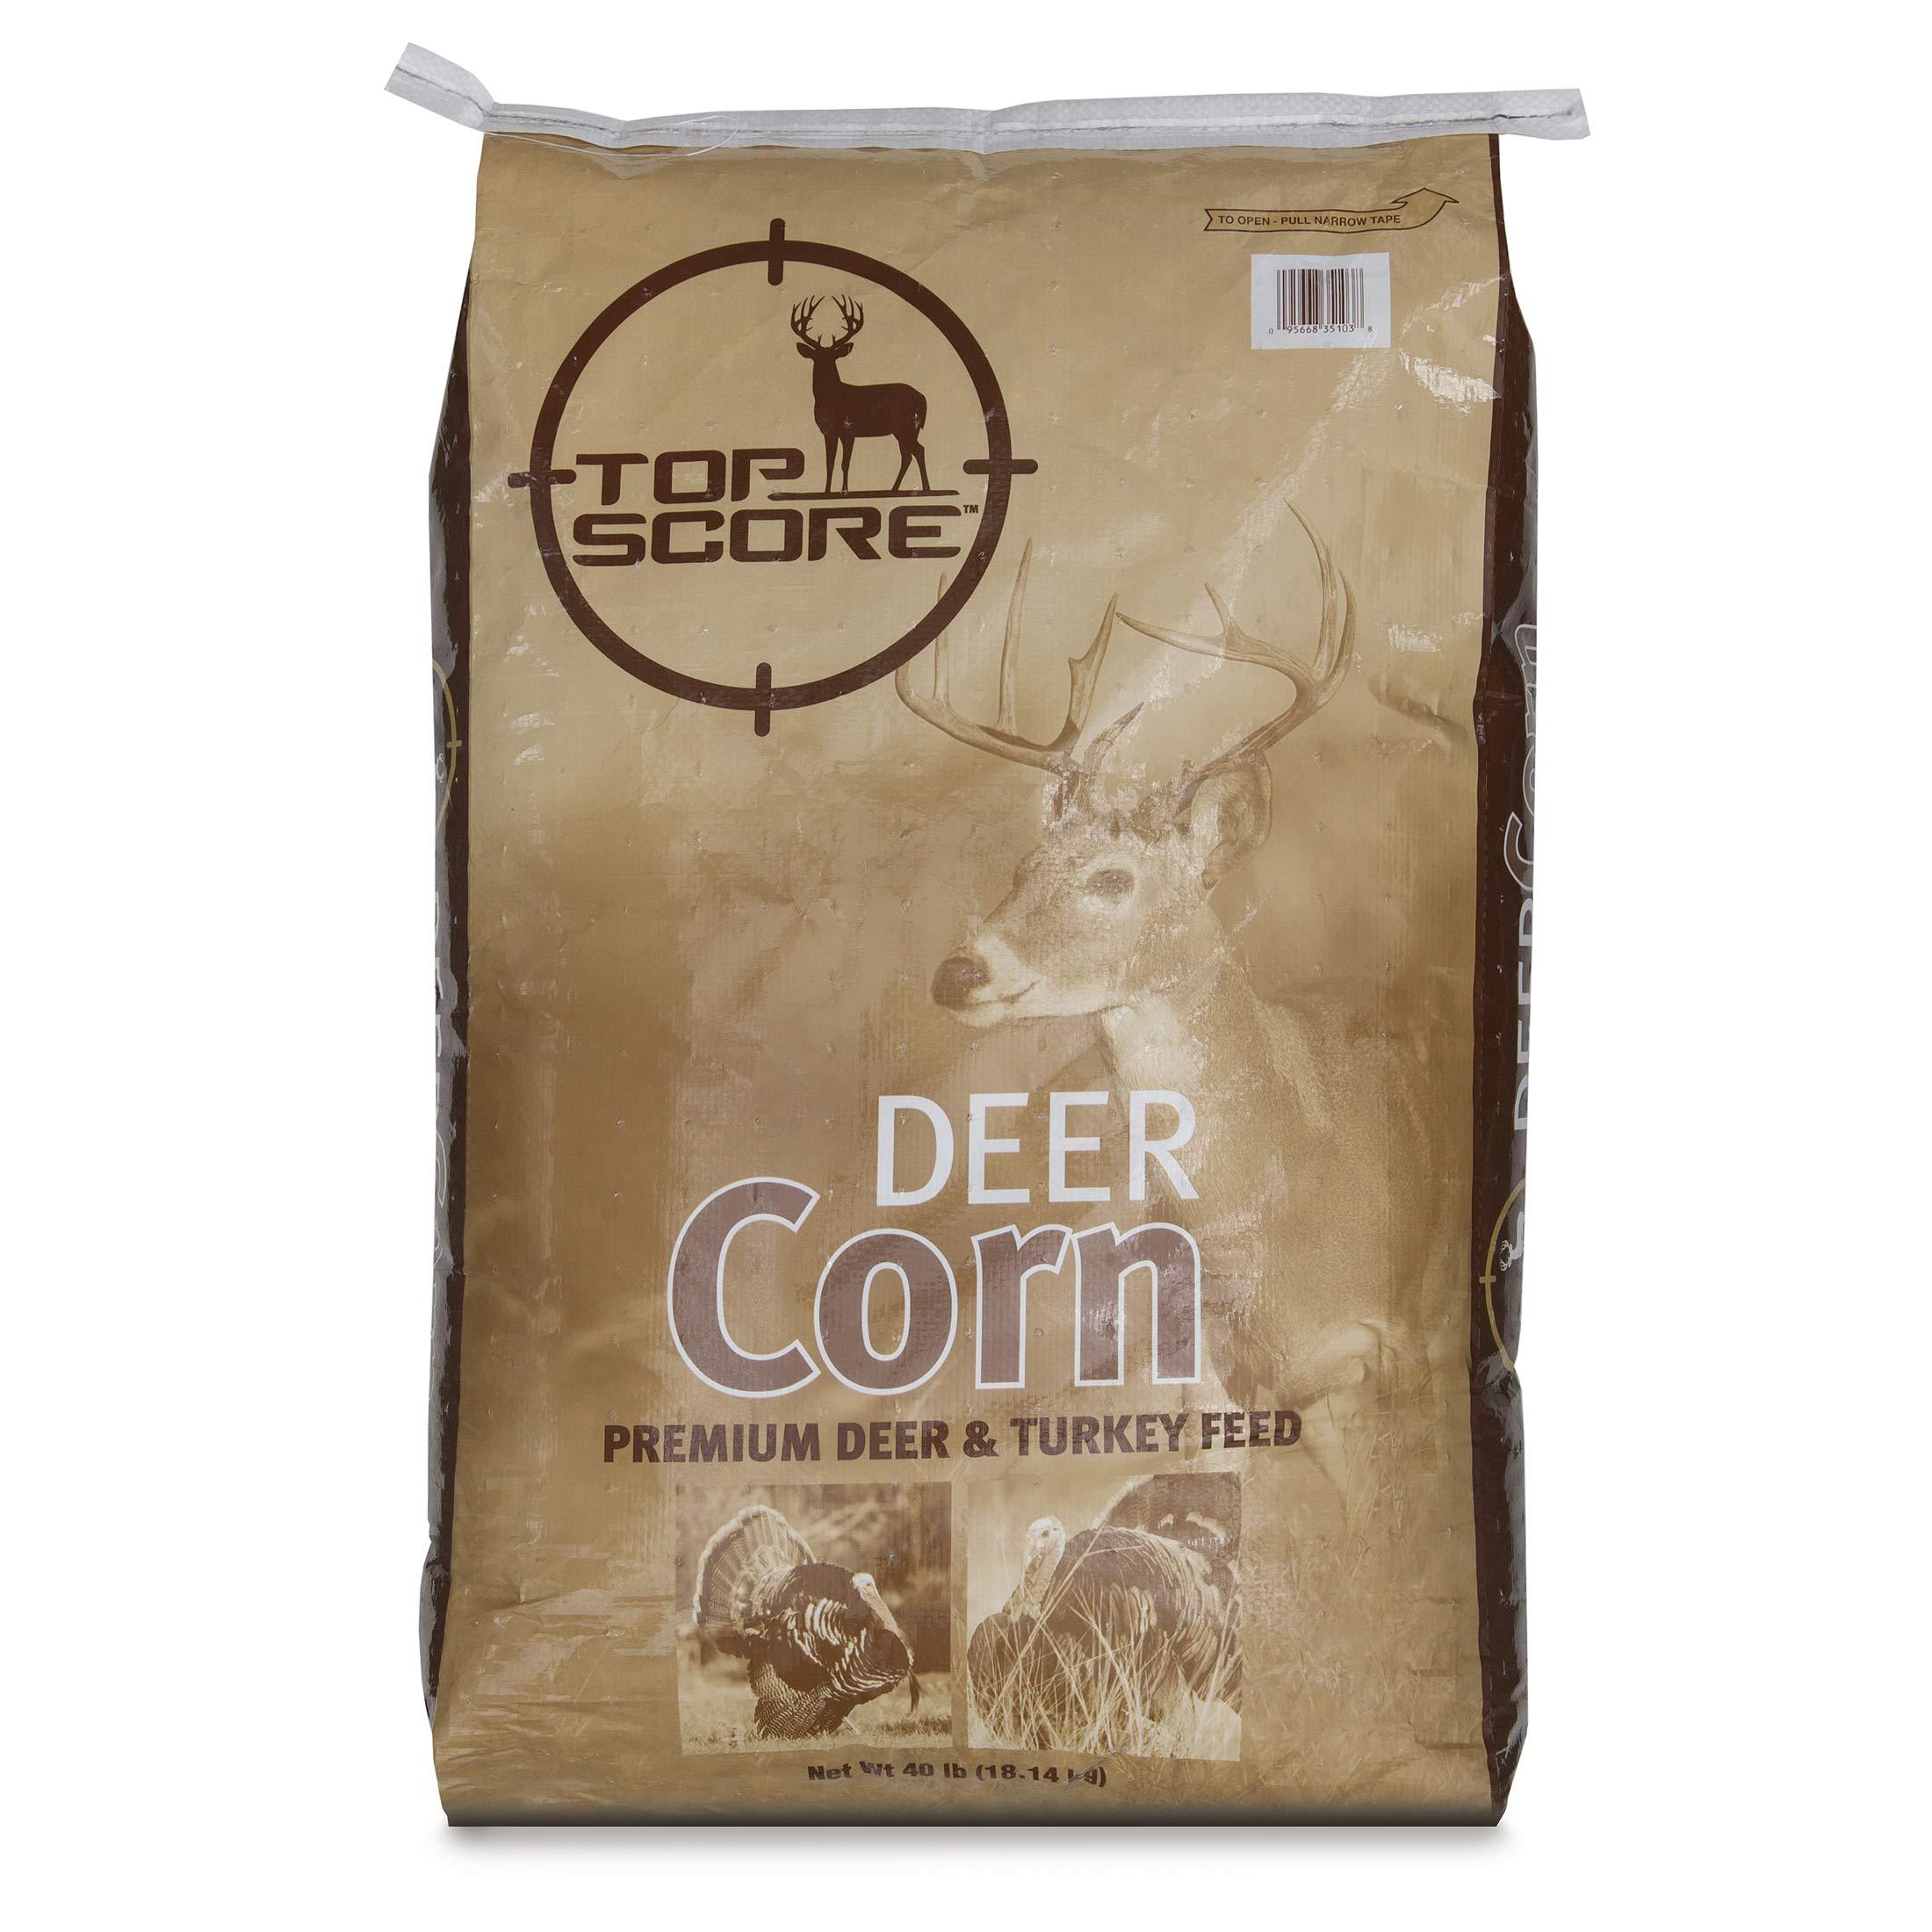 Manna Pro Top Score Deer Corn, 40lb by Manna Pro